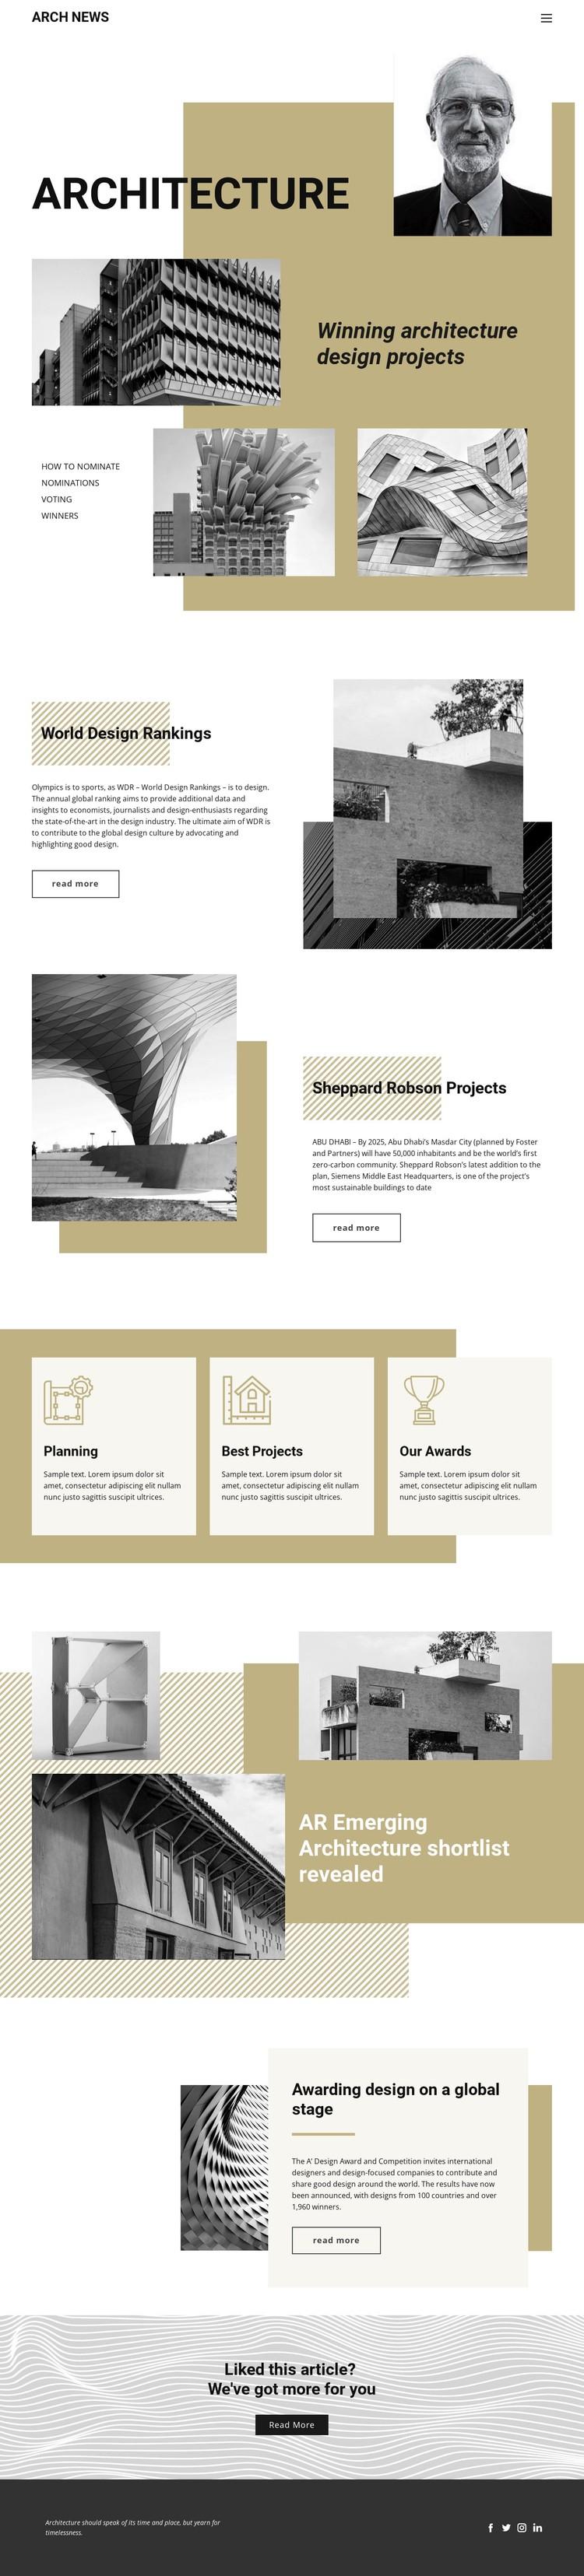 Design of Architecture Static Site Generator